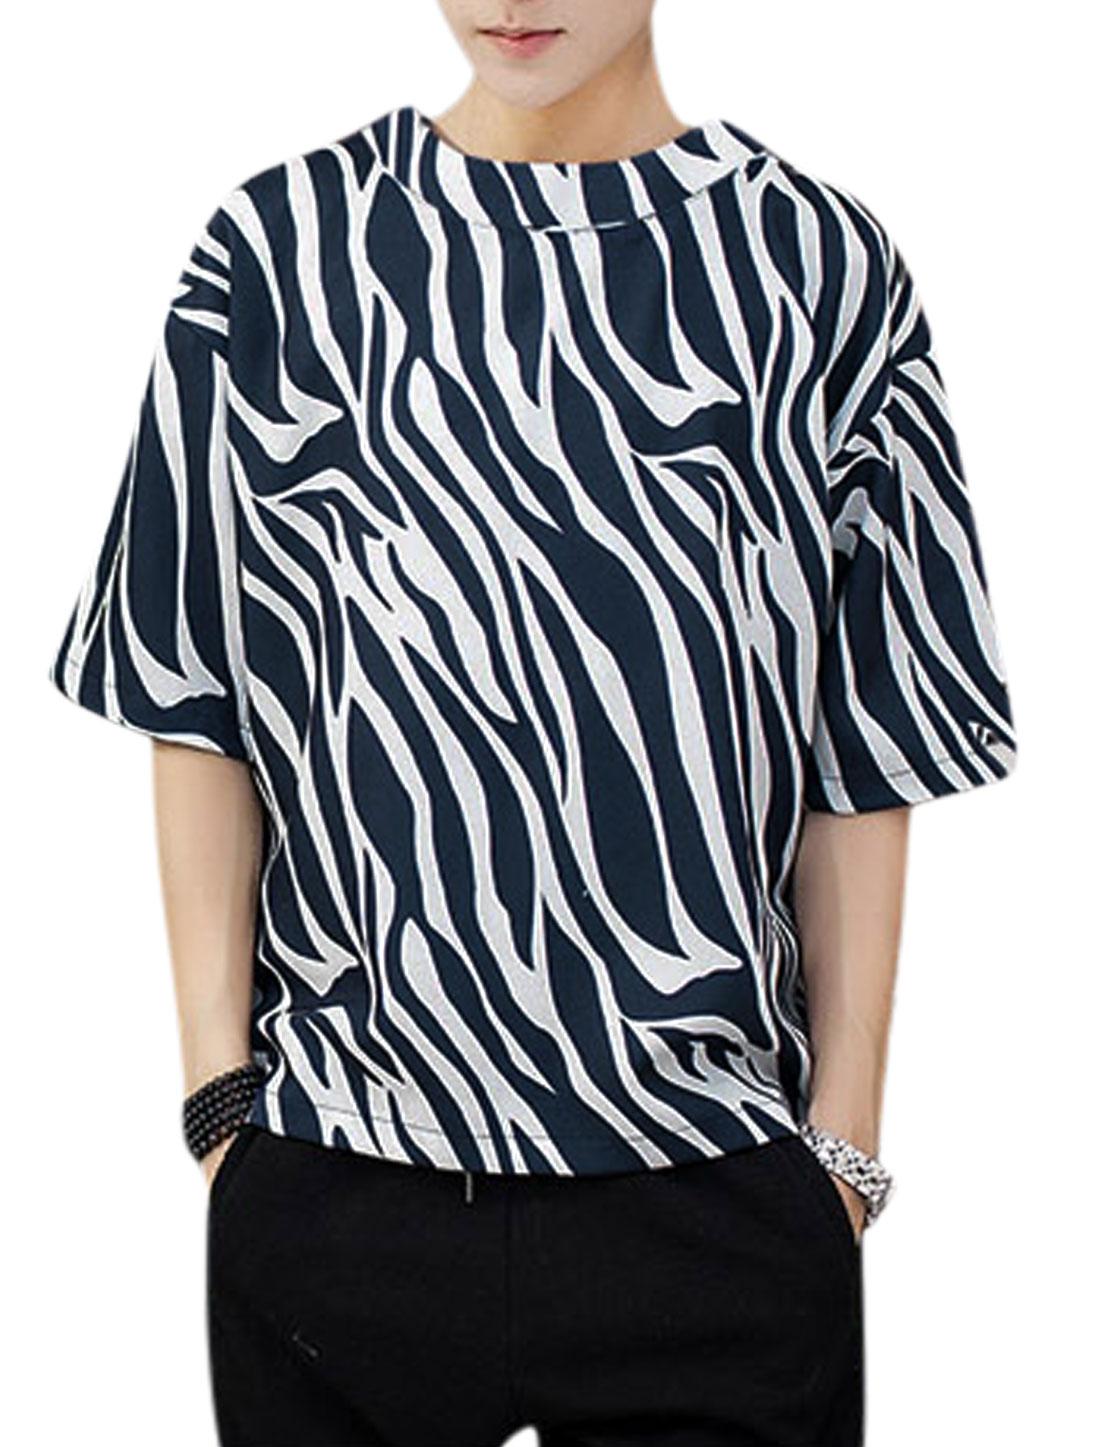 Men Elbow Sleeve Round Neck Zebra Prints T-Shirt Navy Blue White L